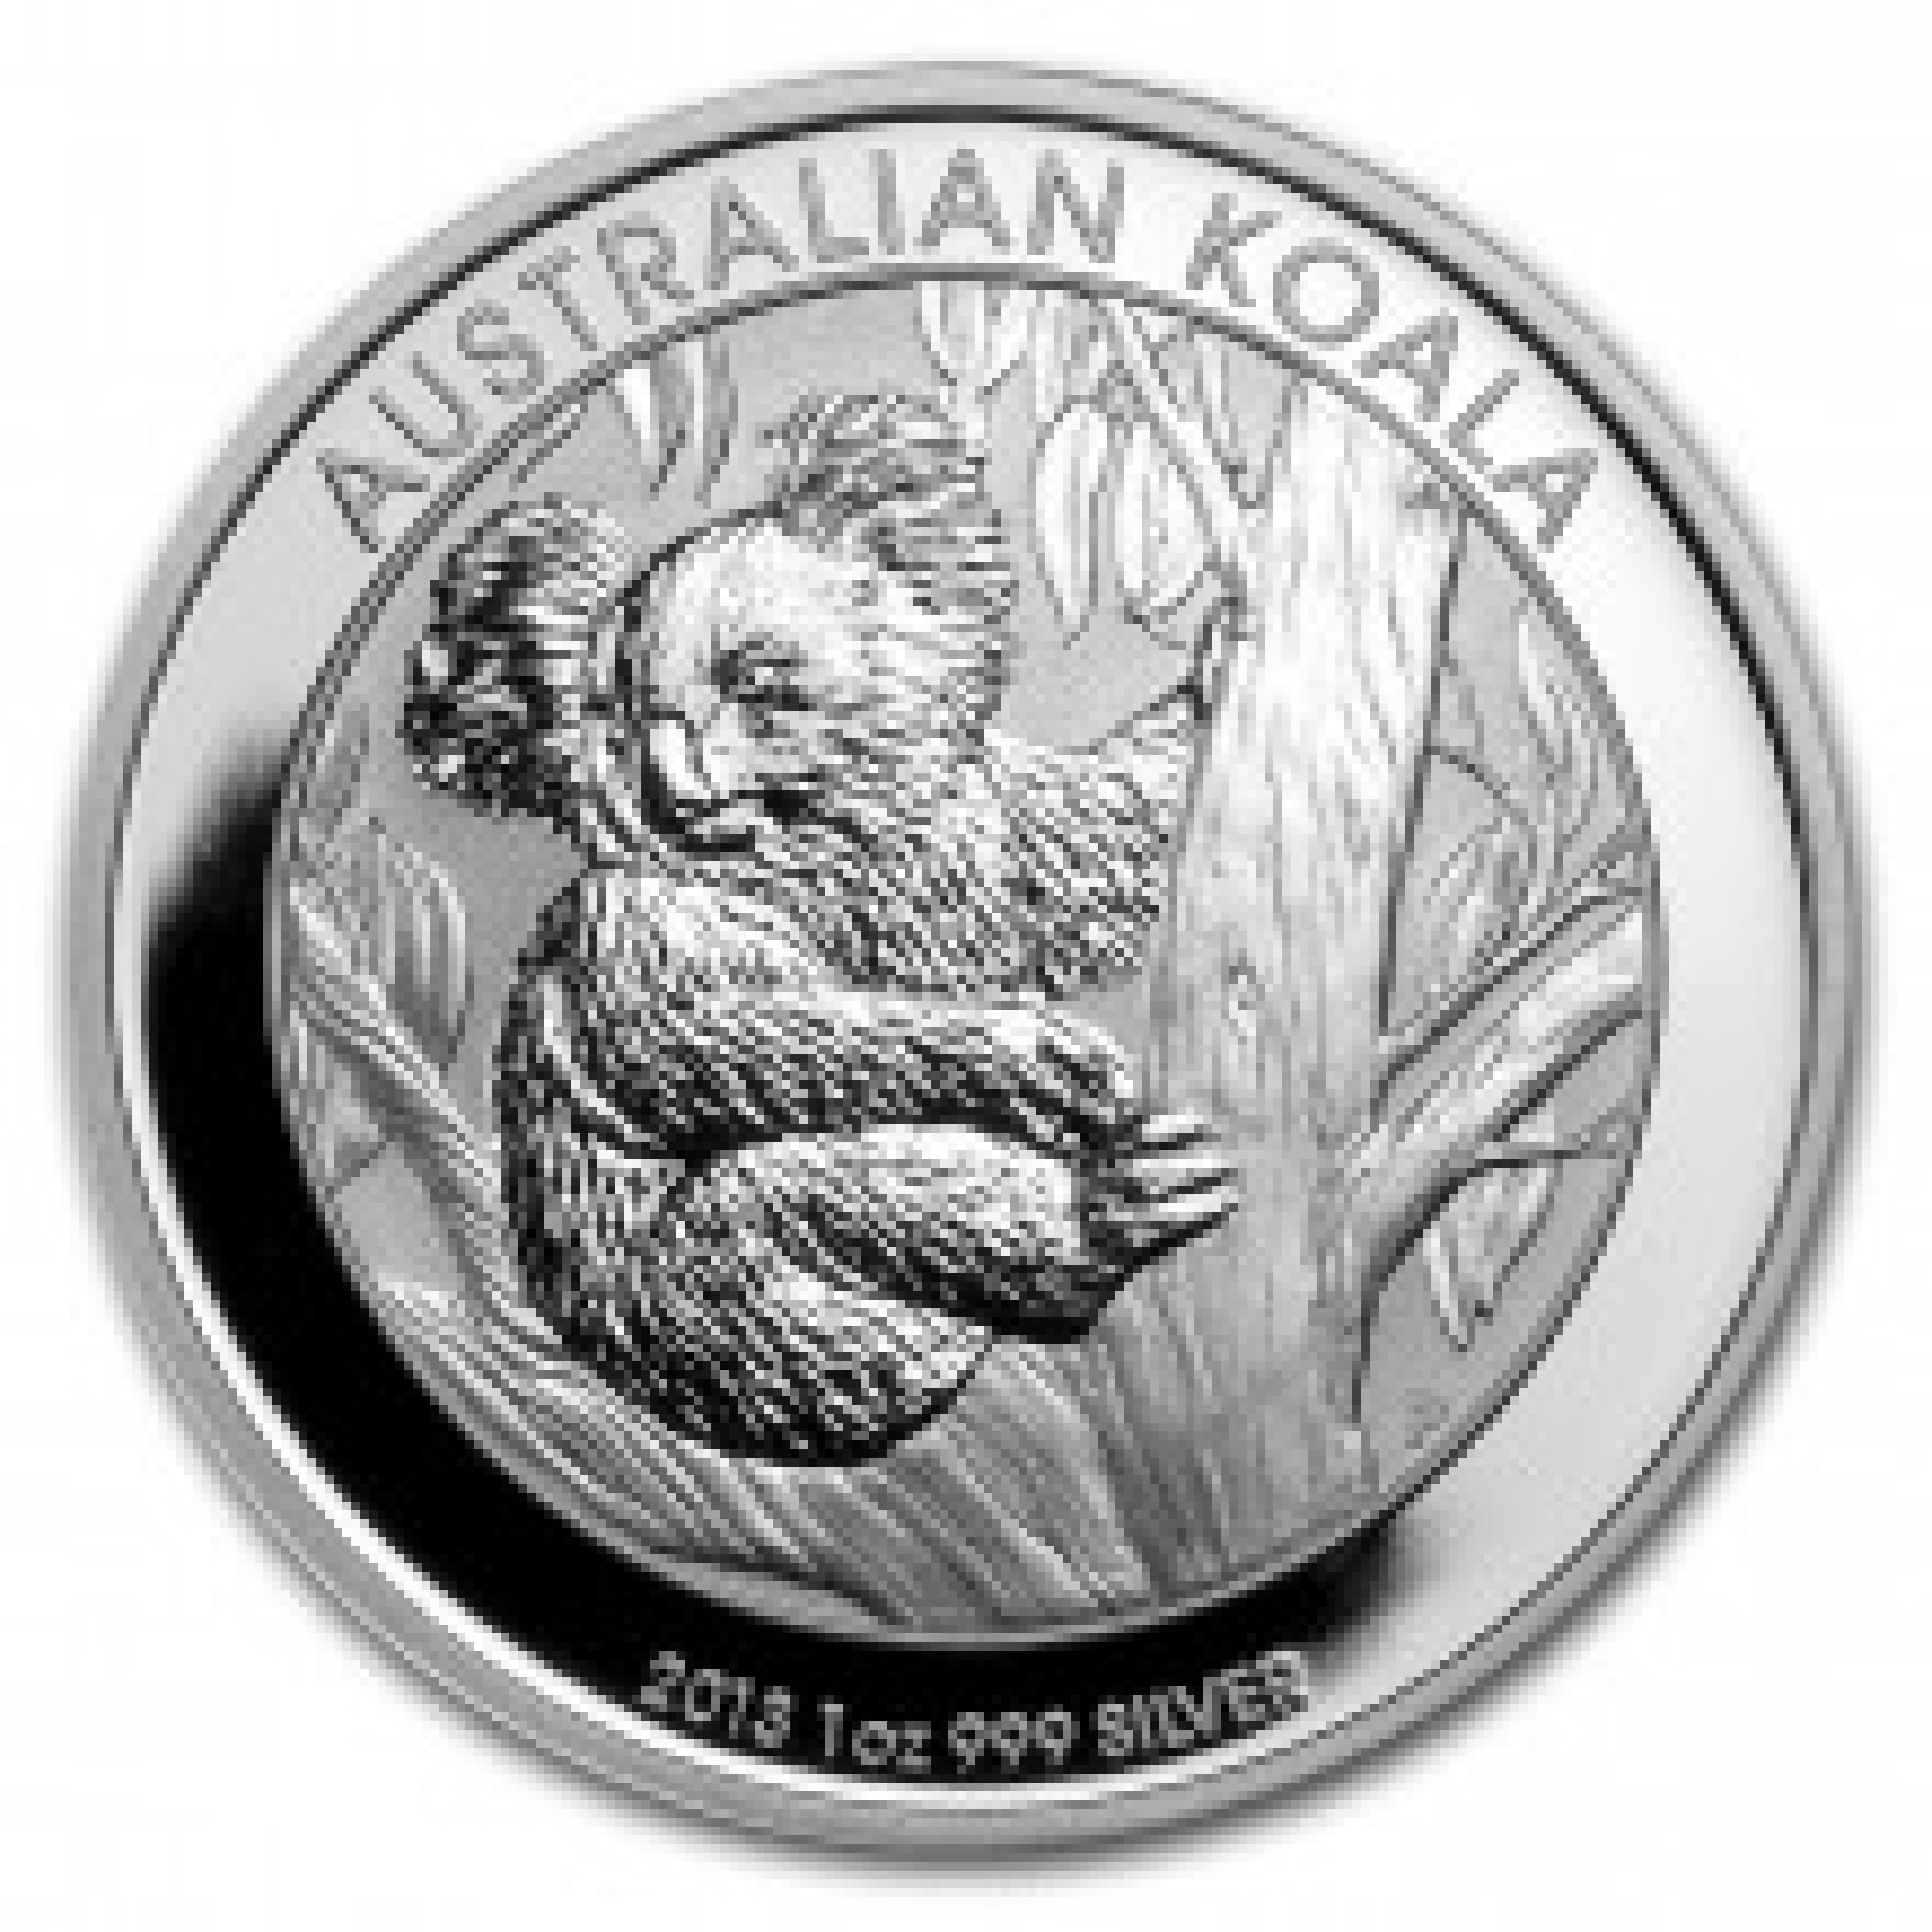 1 Troy ounce silver coin Koala 2013